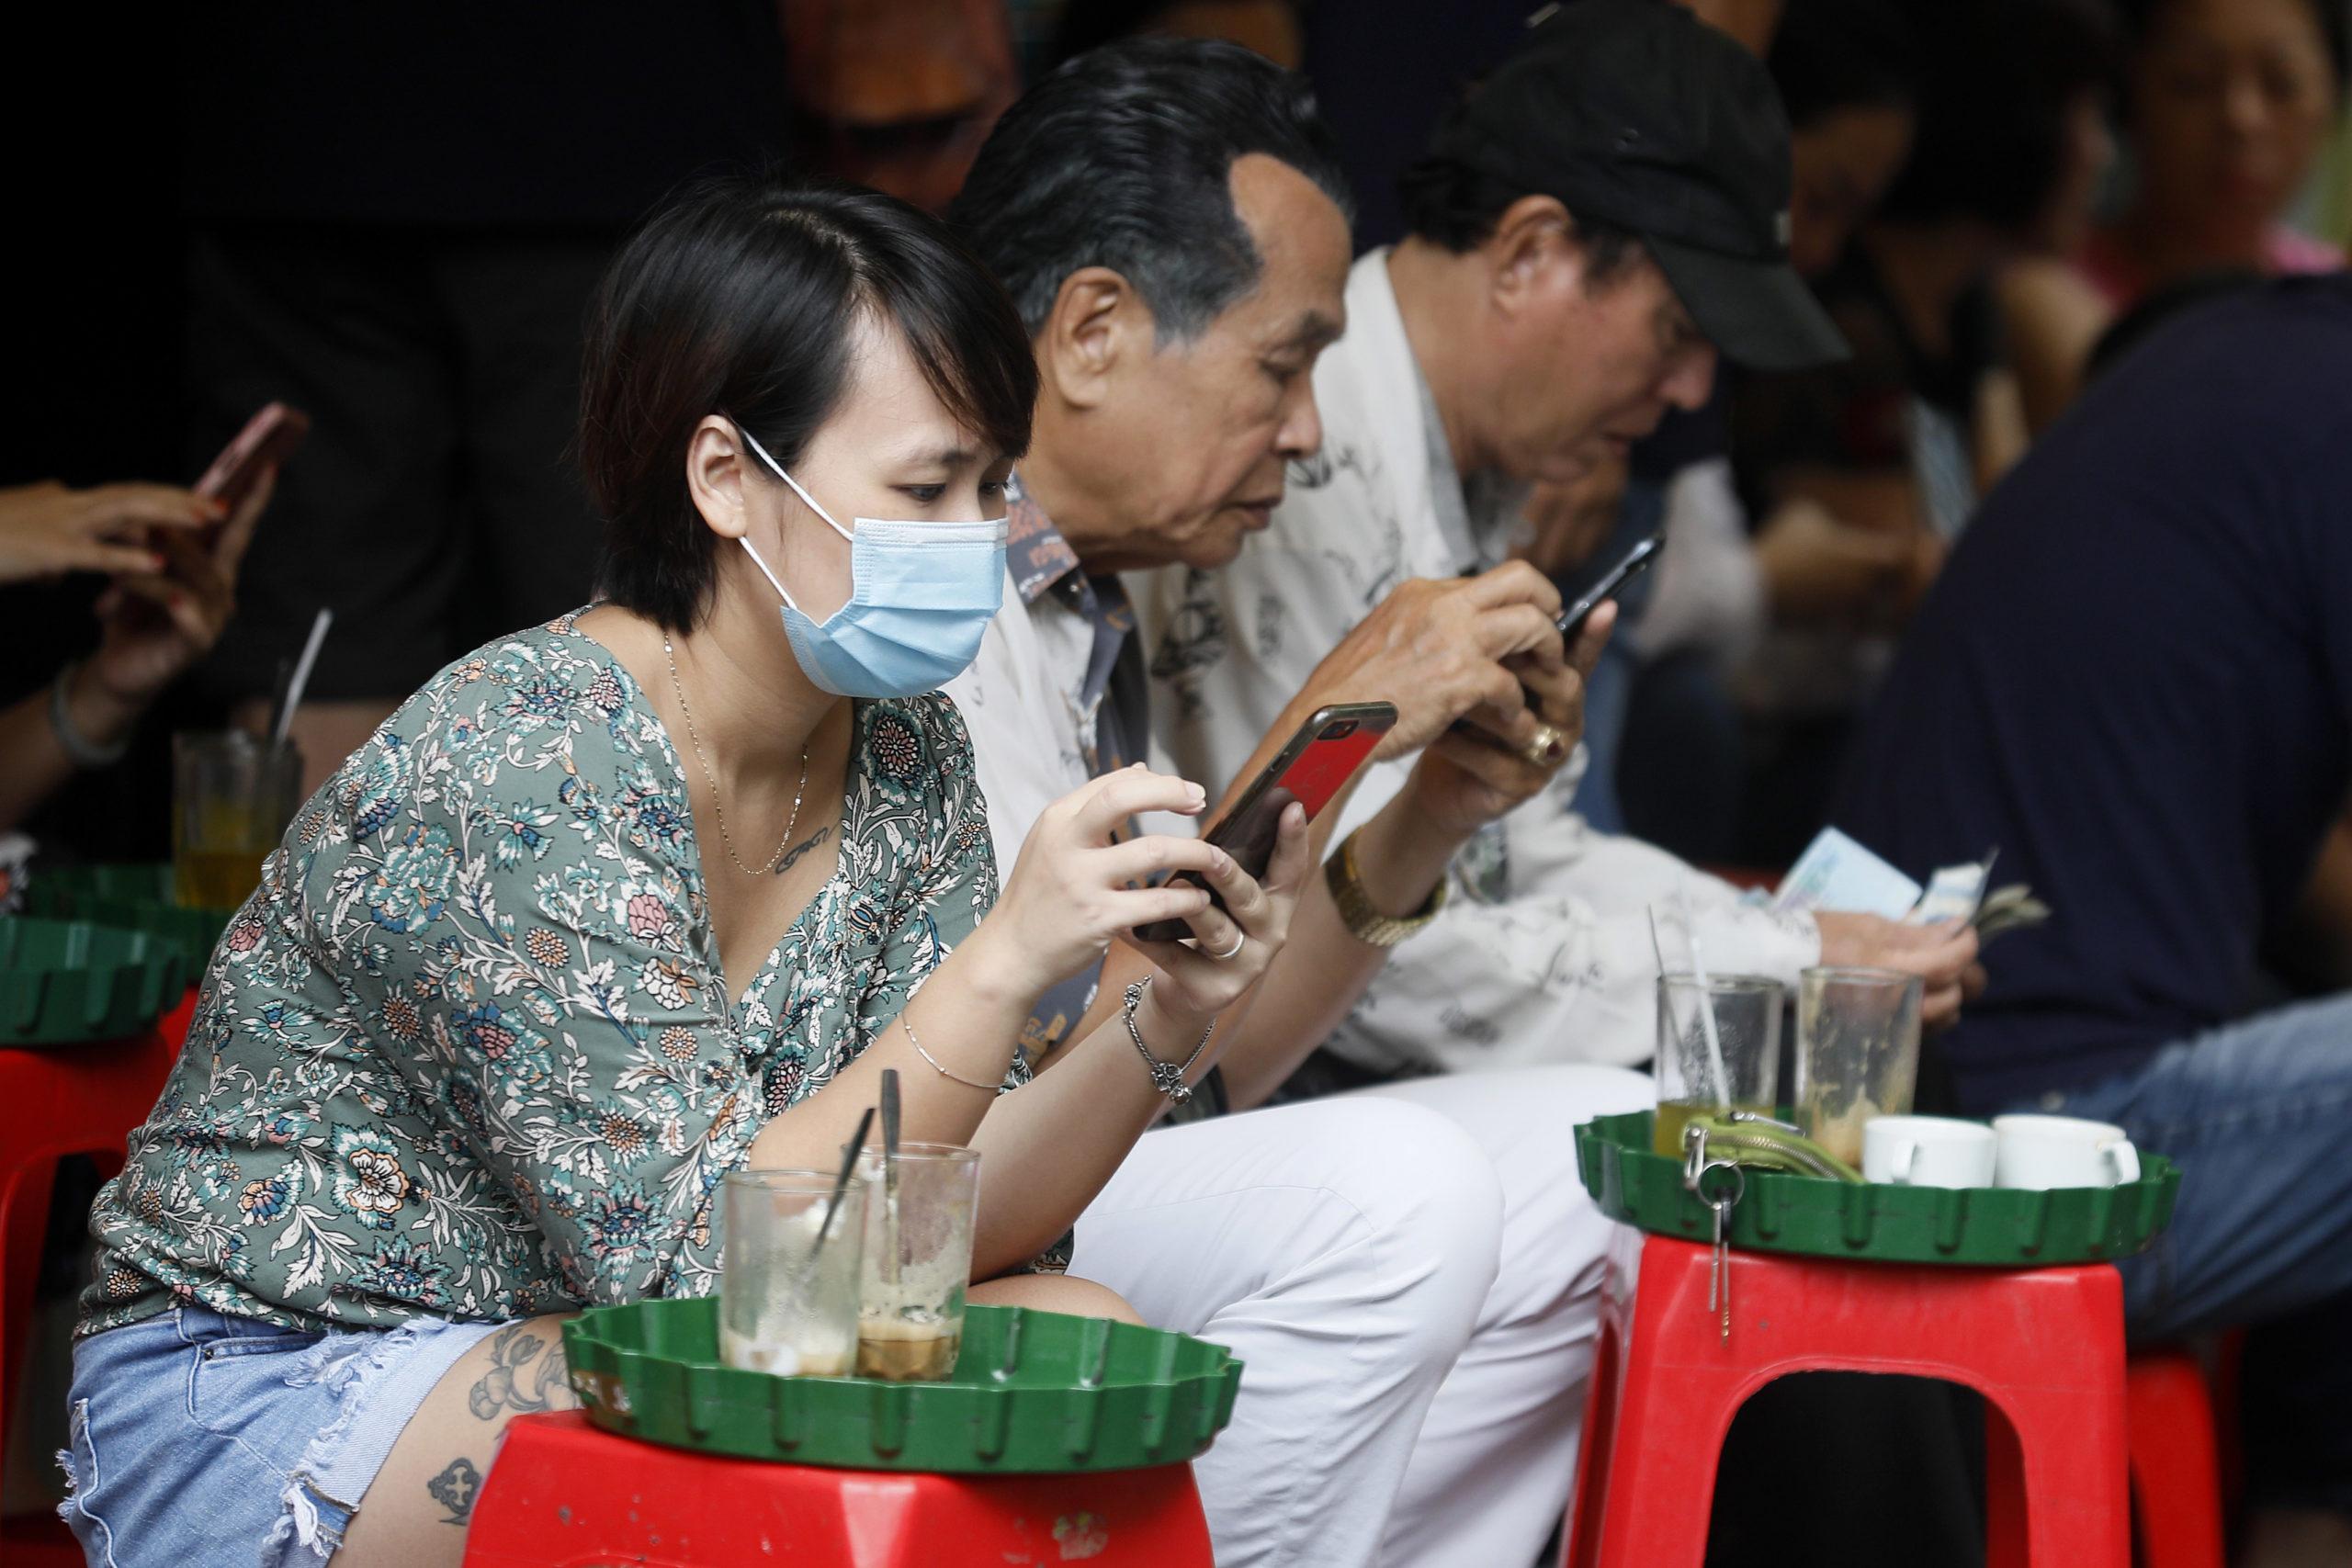 Vietnam's contact-tracing app: Public health tool or creeping surveillance?